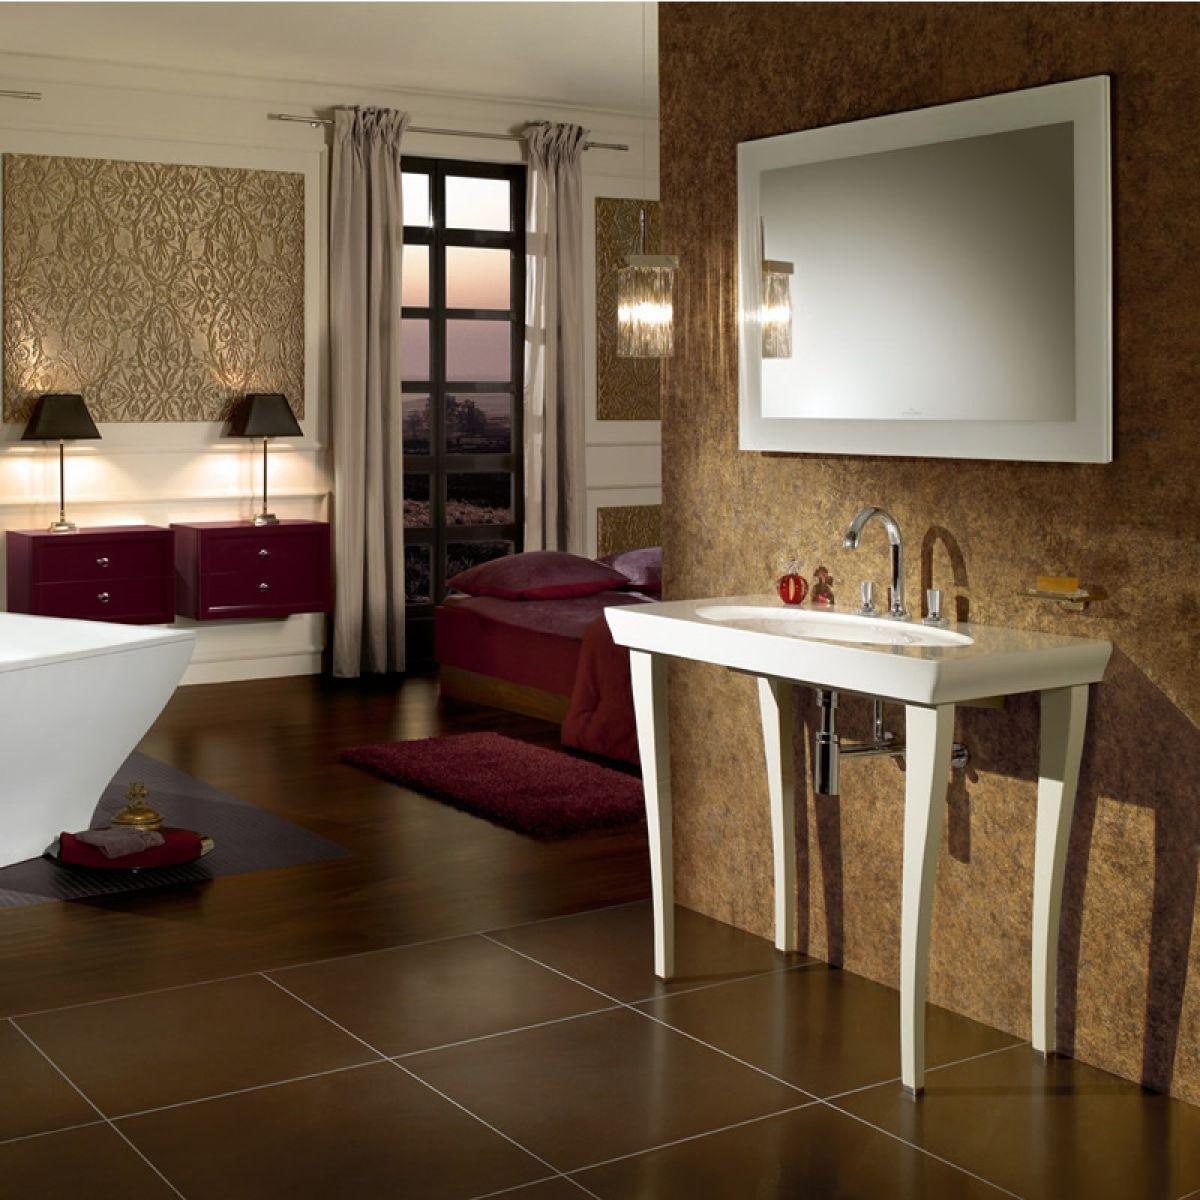 Villeroy and boch bathroom cabinets - Villeroy Boch La Belle 1000mm Washbasin 6124 11r1